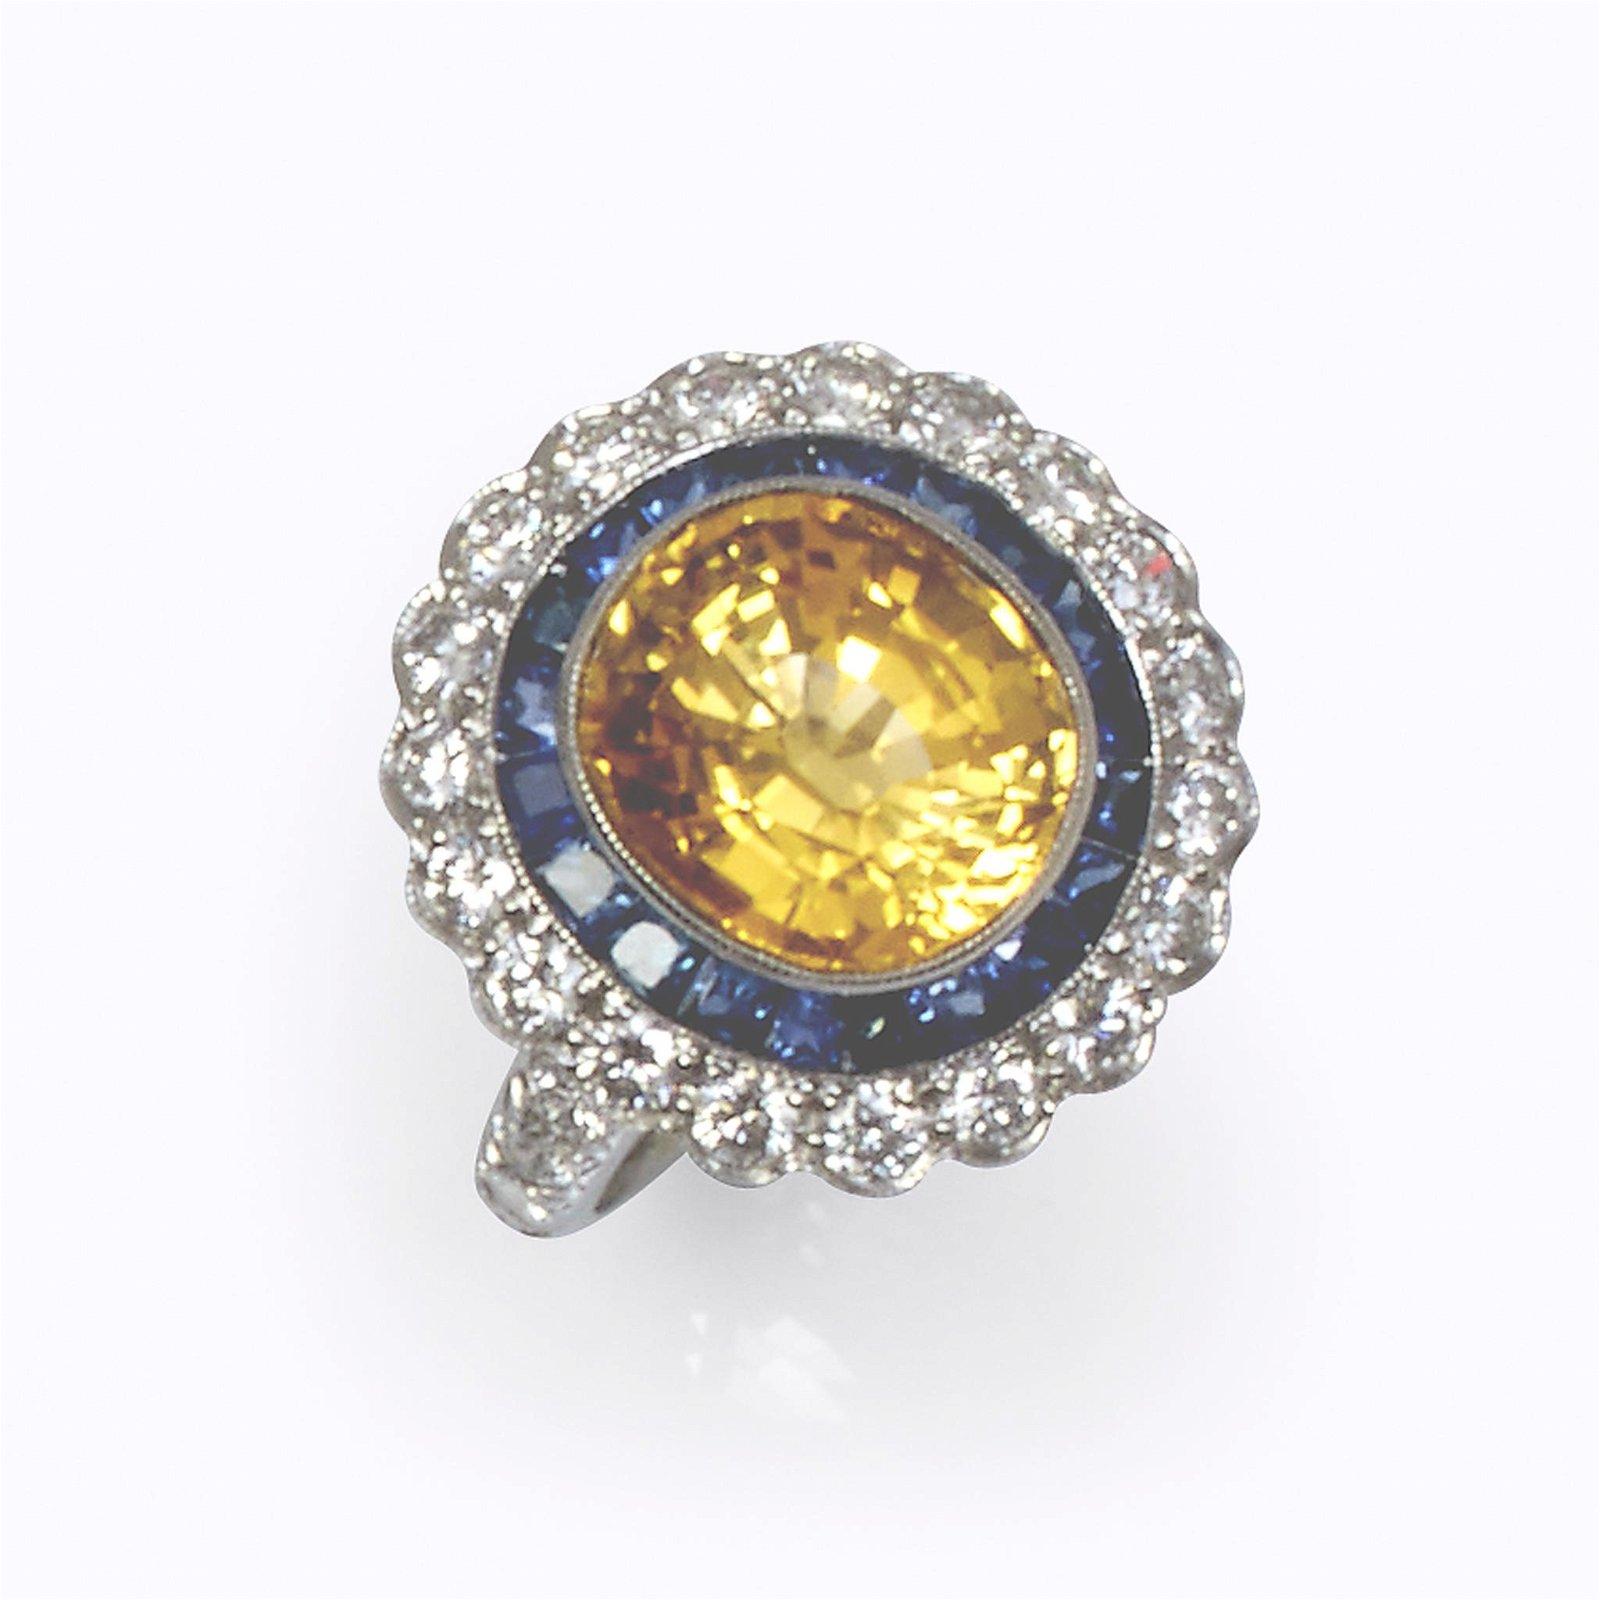 A yellow sapphire, sapphire, diamond, and platinum